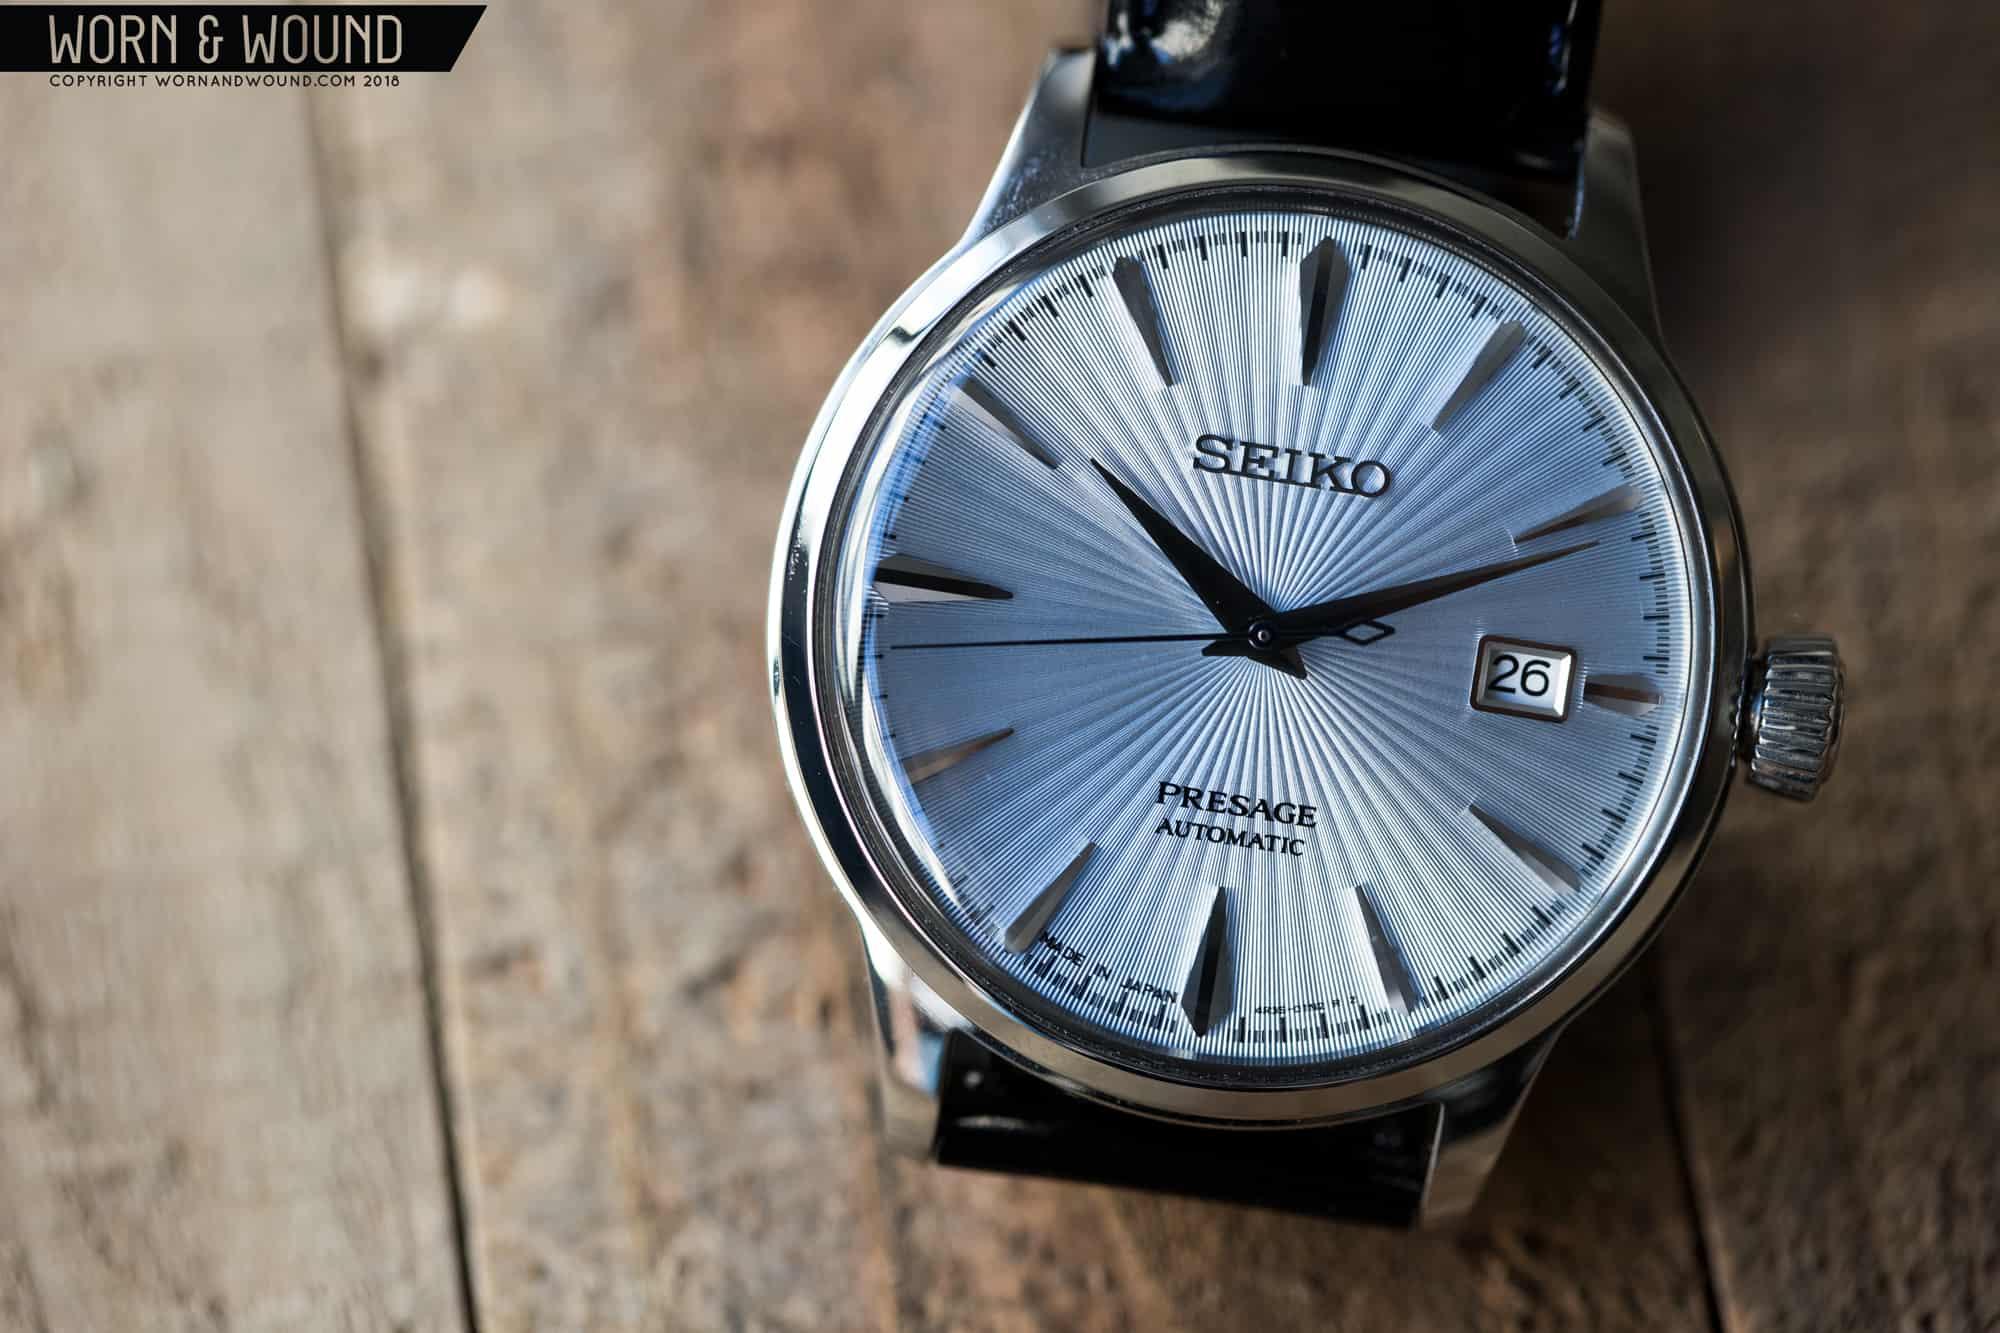 Seiko Presage Automatic Cocktail Time Watch,SRPB43J1 £263.20 @ John Lewis & Partners